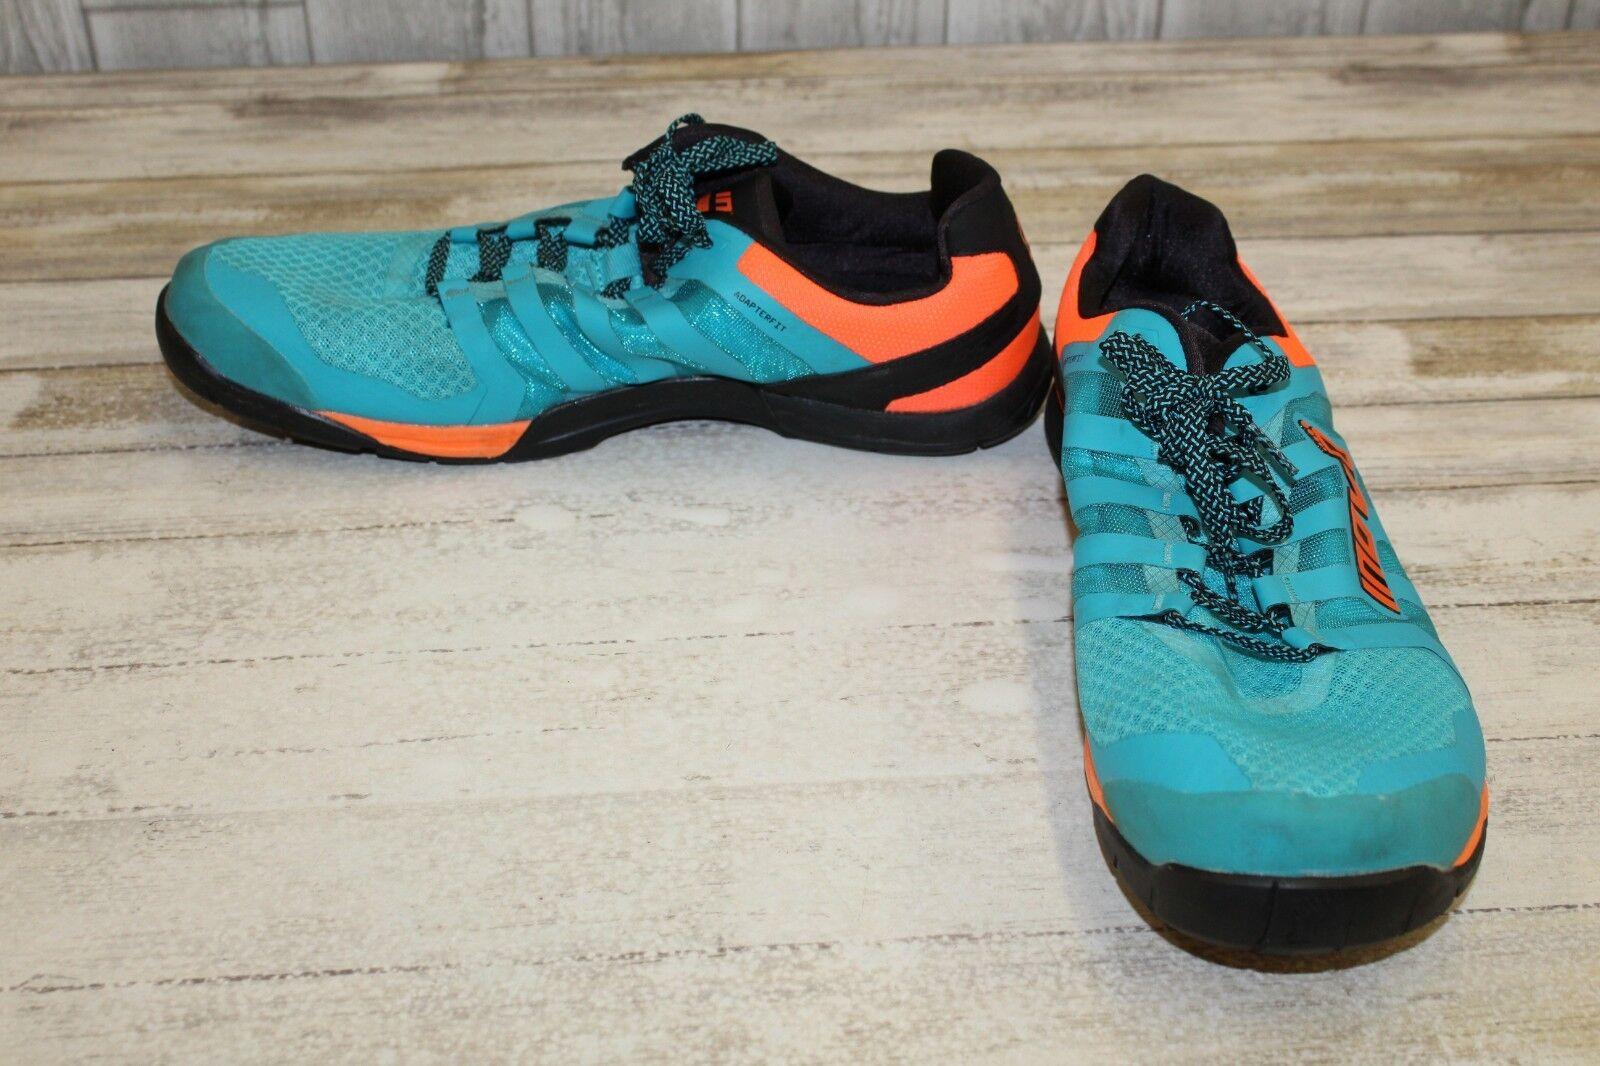 **inov-8 F-Lite 235 Athletic Shoes, Men's Size 12.5, Blue